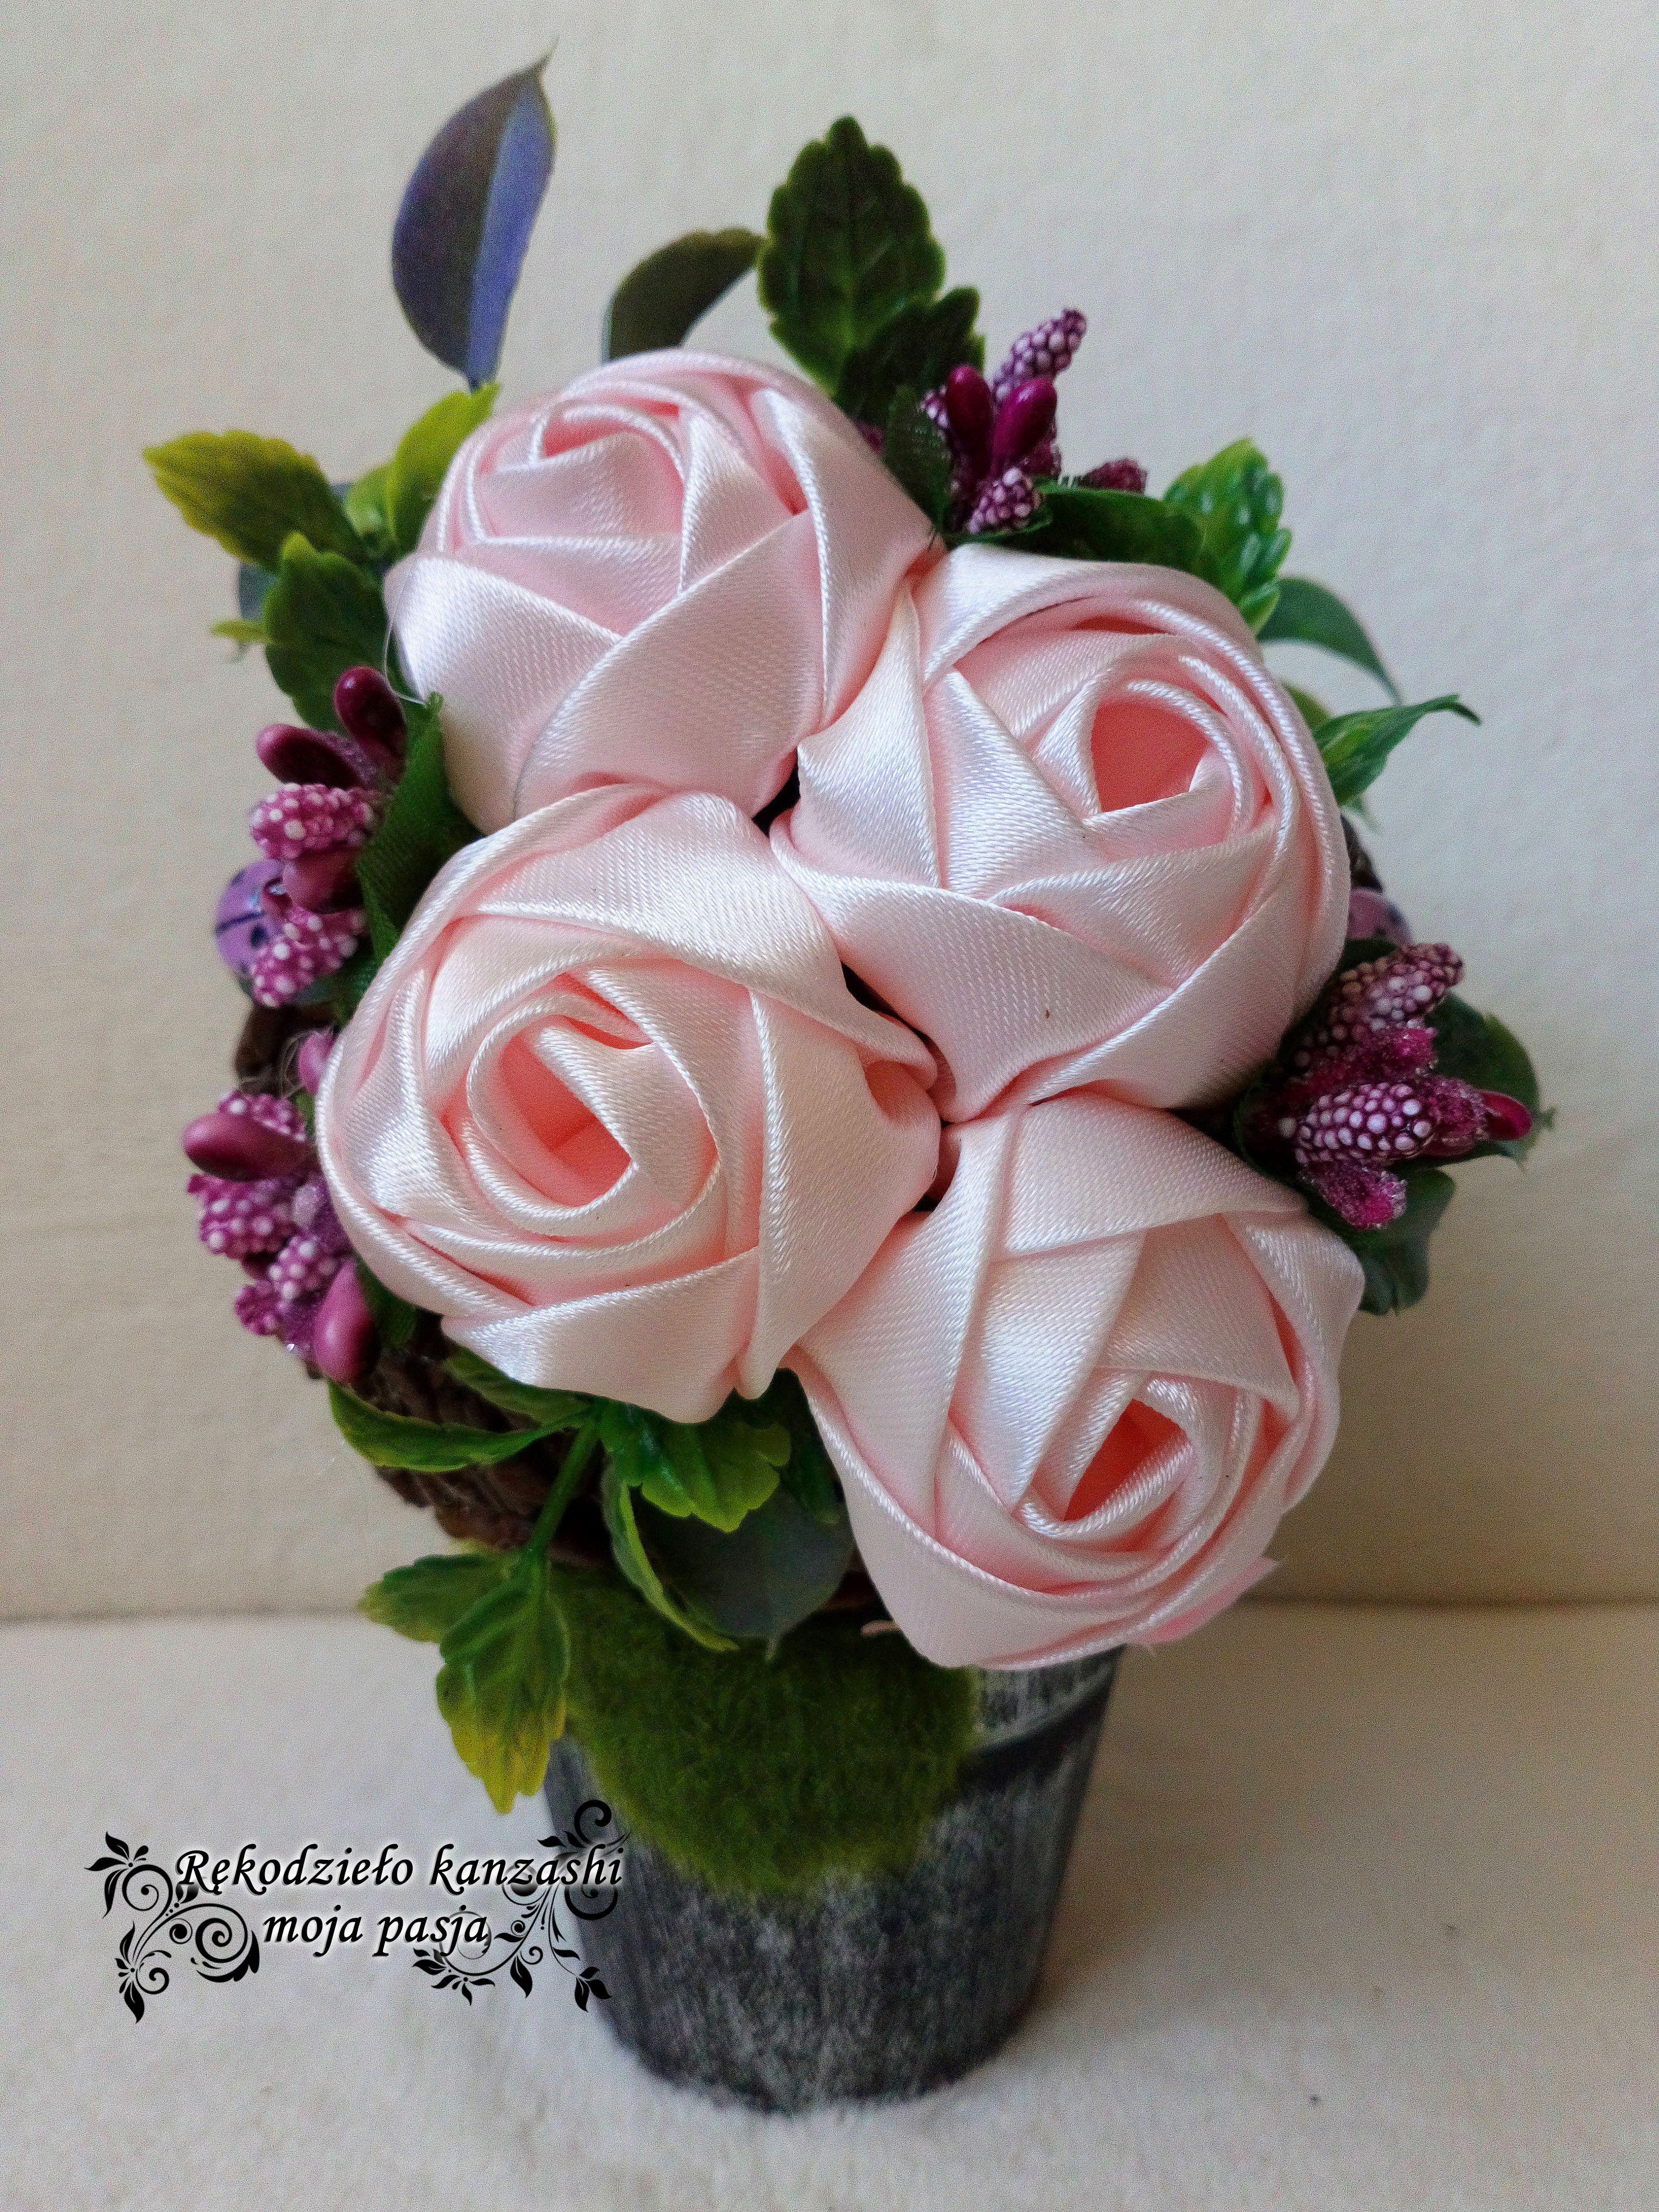 Flower Box Kawowy Na Doniczce Rose Plants Flowers